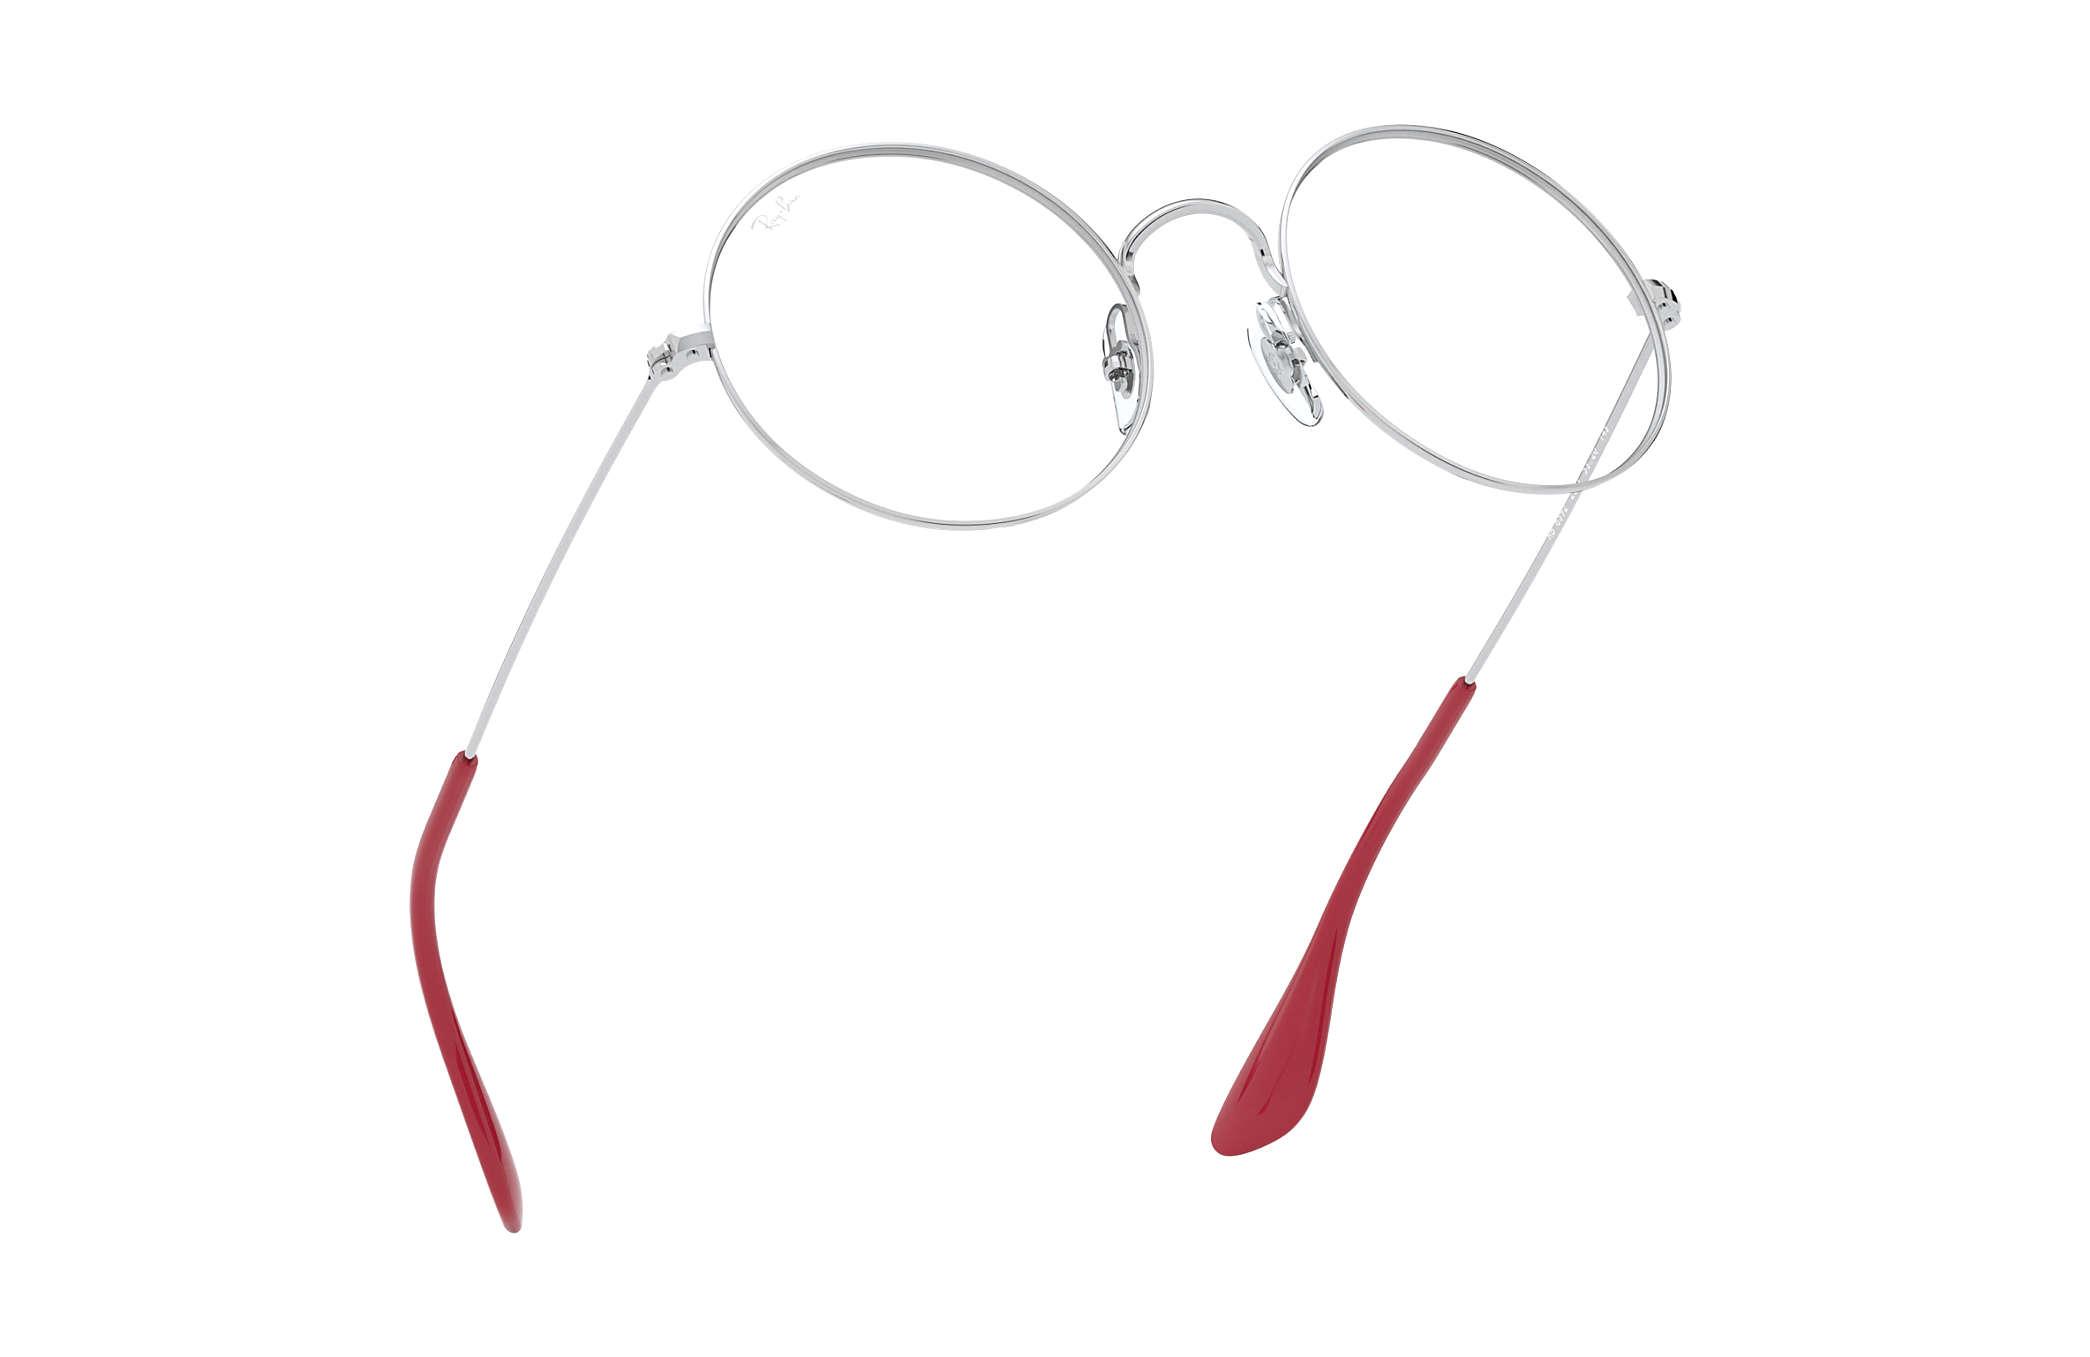 c8c4271d180f0 Ray-Ban prescription glasses Ja-jo Optics RB6392 Silver - Metal ...